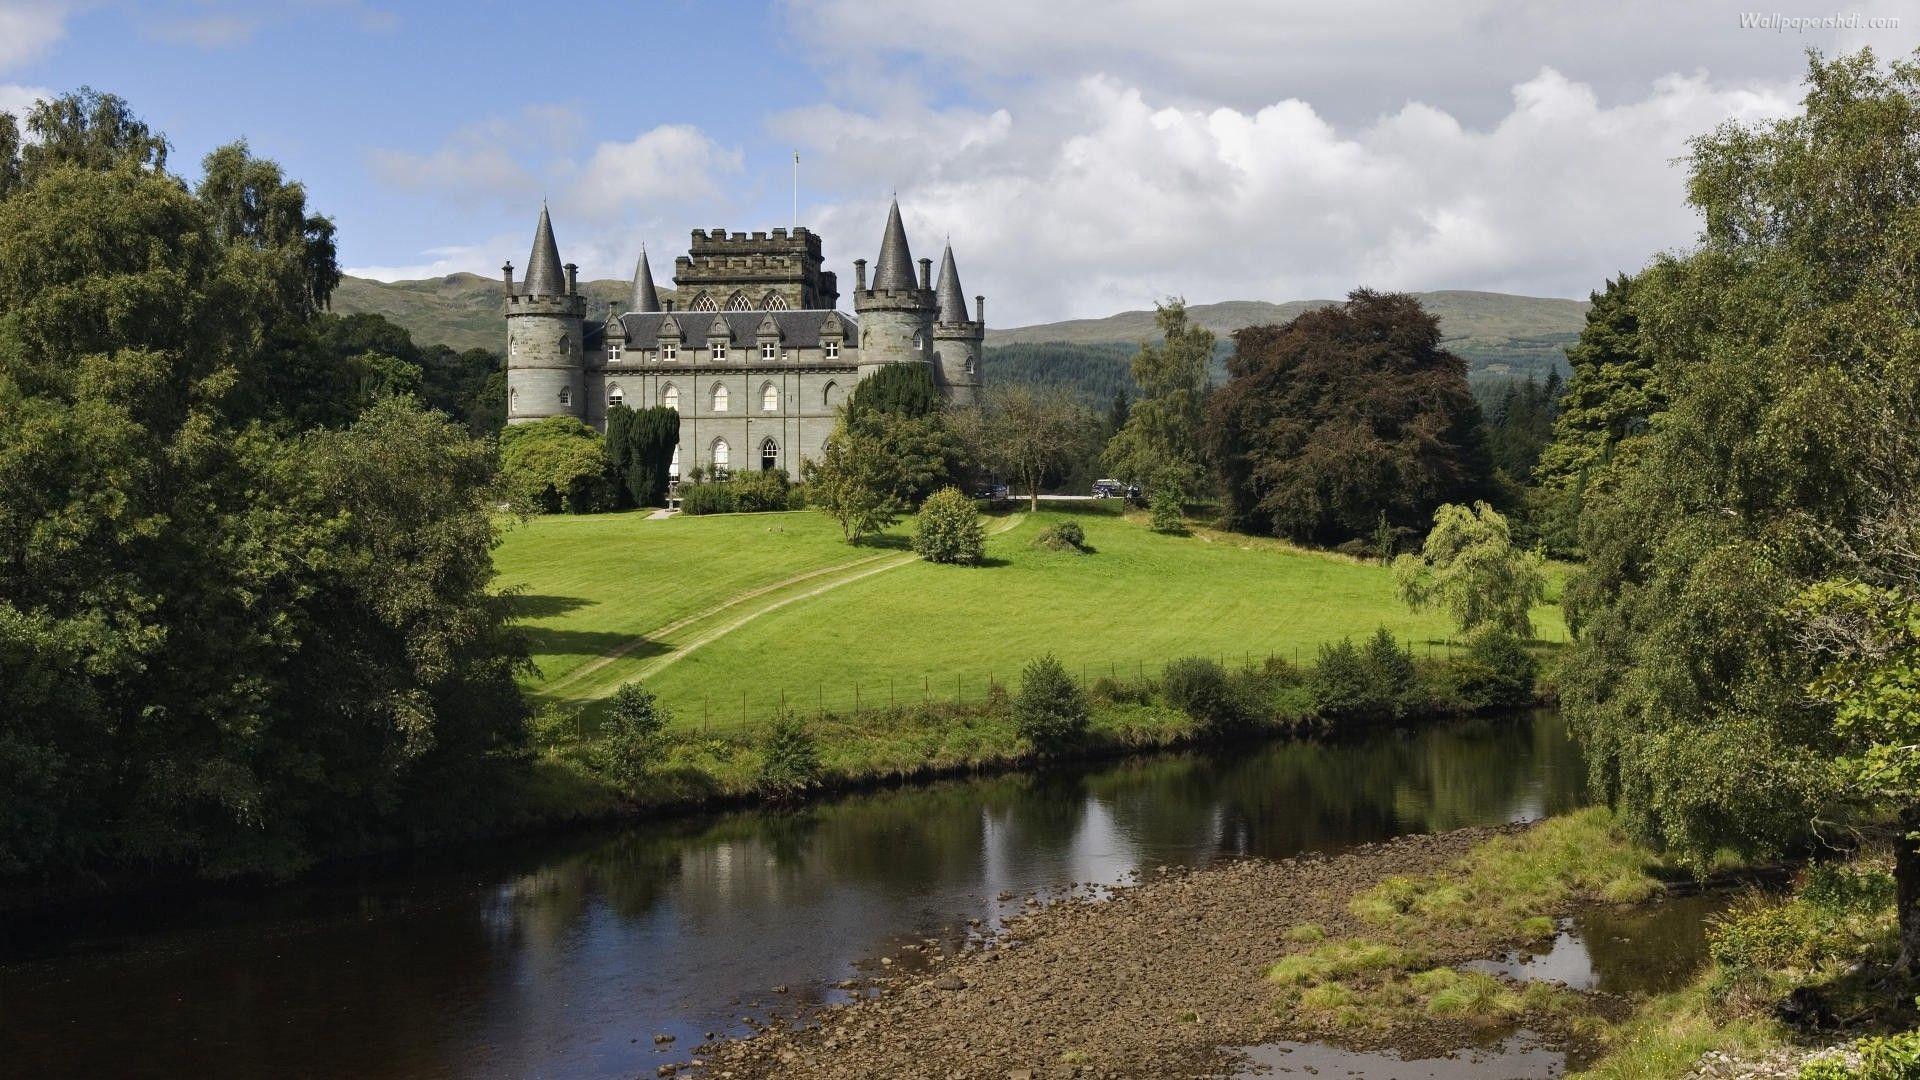 Res: 1920x1080, Image detail for -Wallpaper, castle, scotland, wallpapers, widescreen,  original - 573116